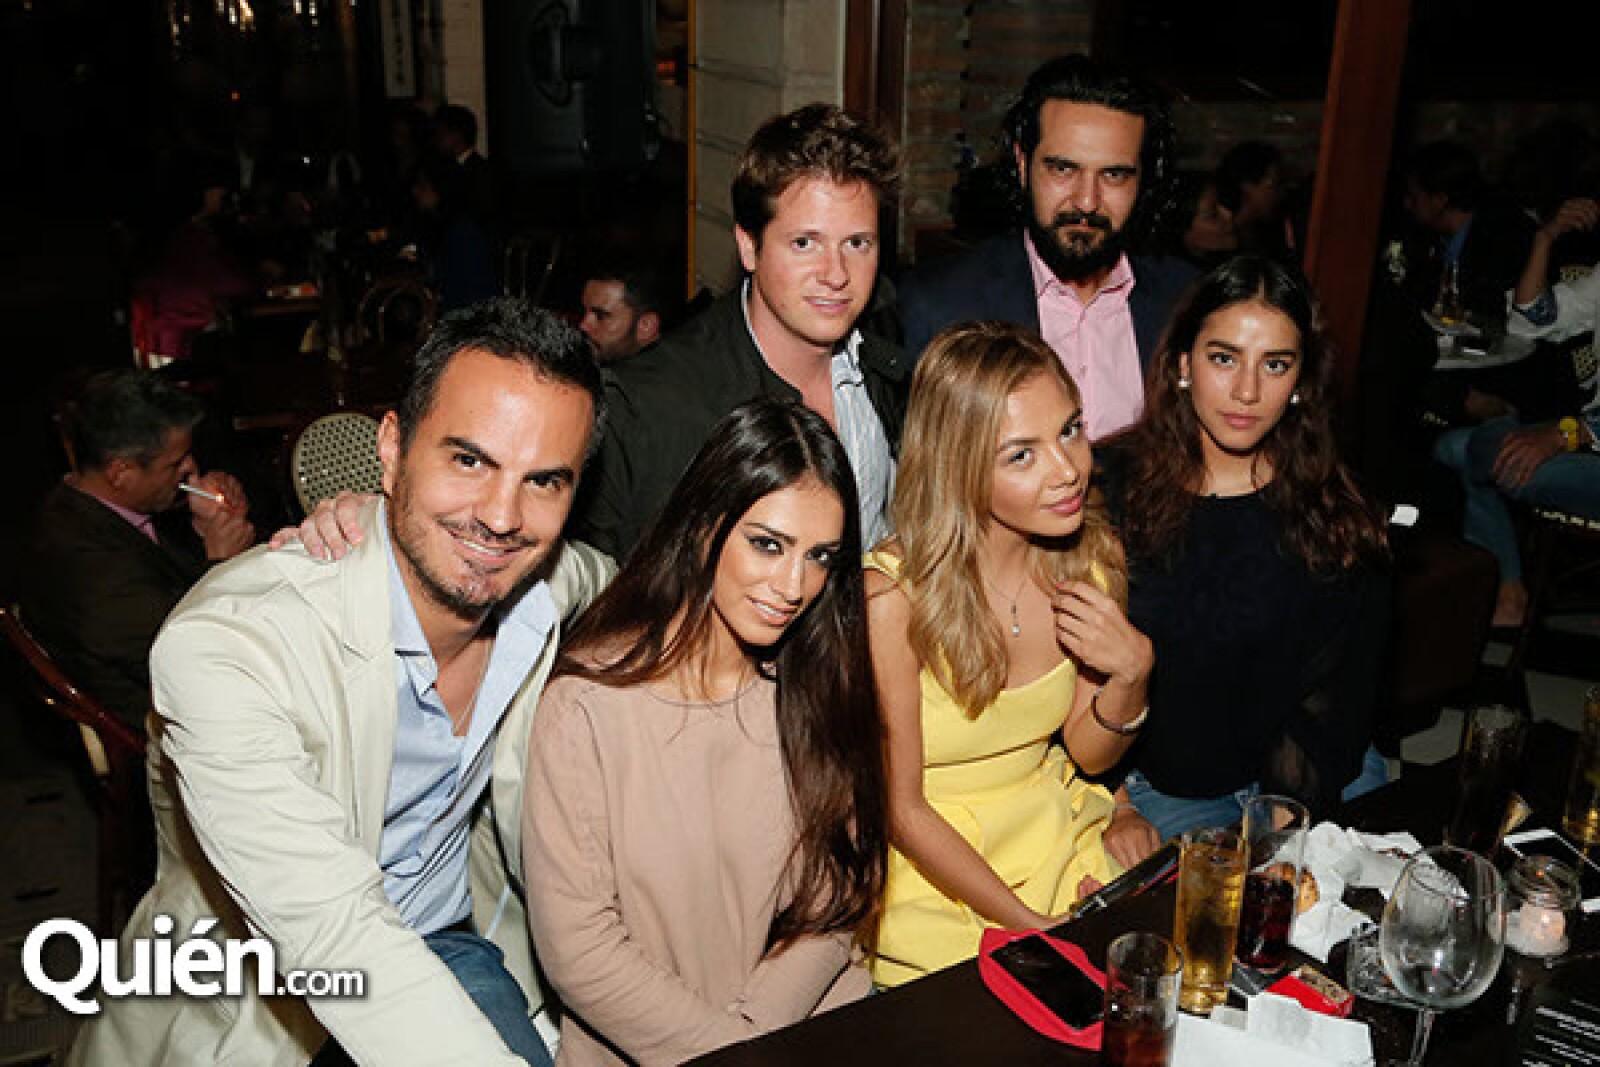 Vieri Figallo, Félix Ribott, Paris Shaadi, Belinda Molina, Lia Alcaráz y Dafne Molina